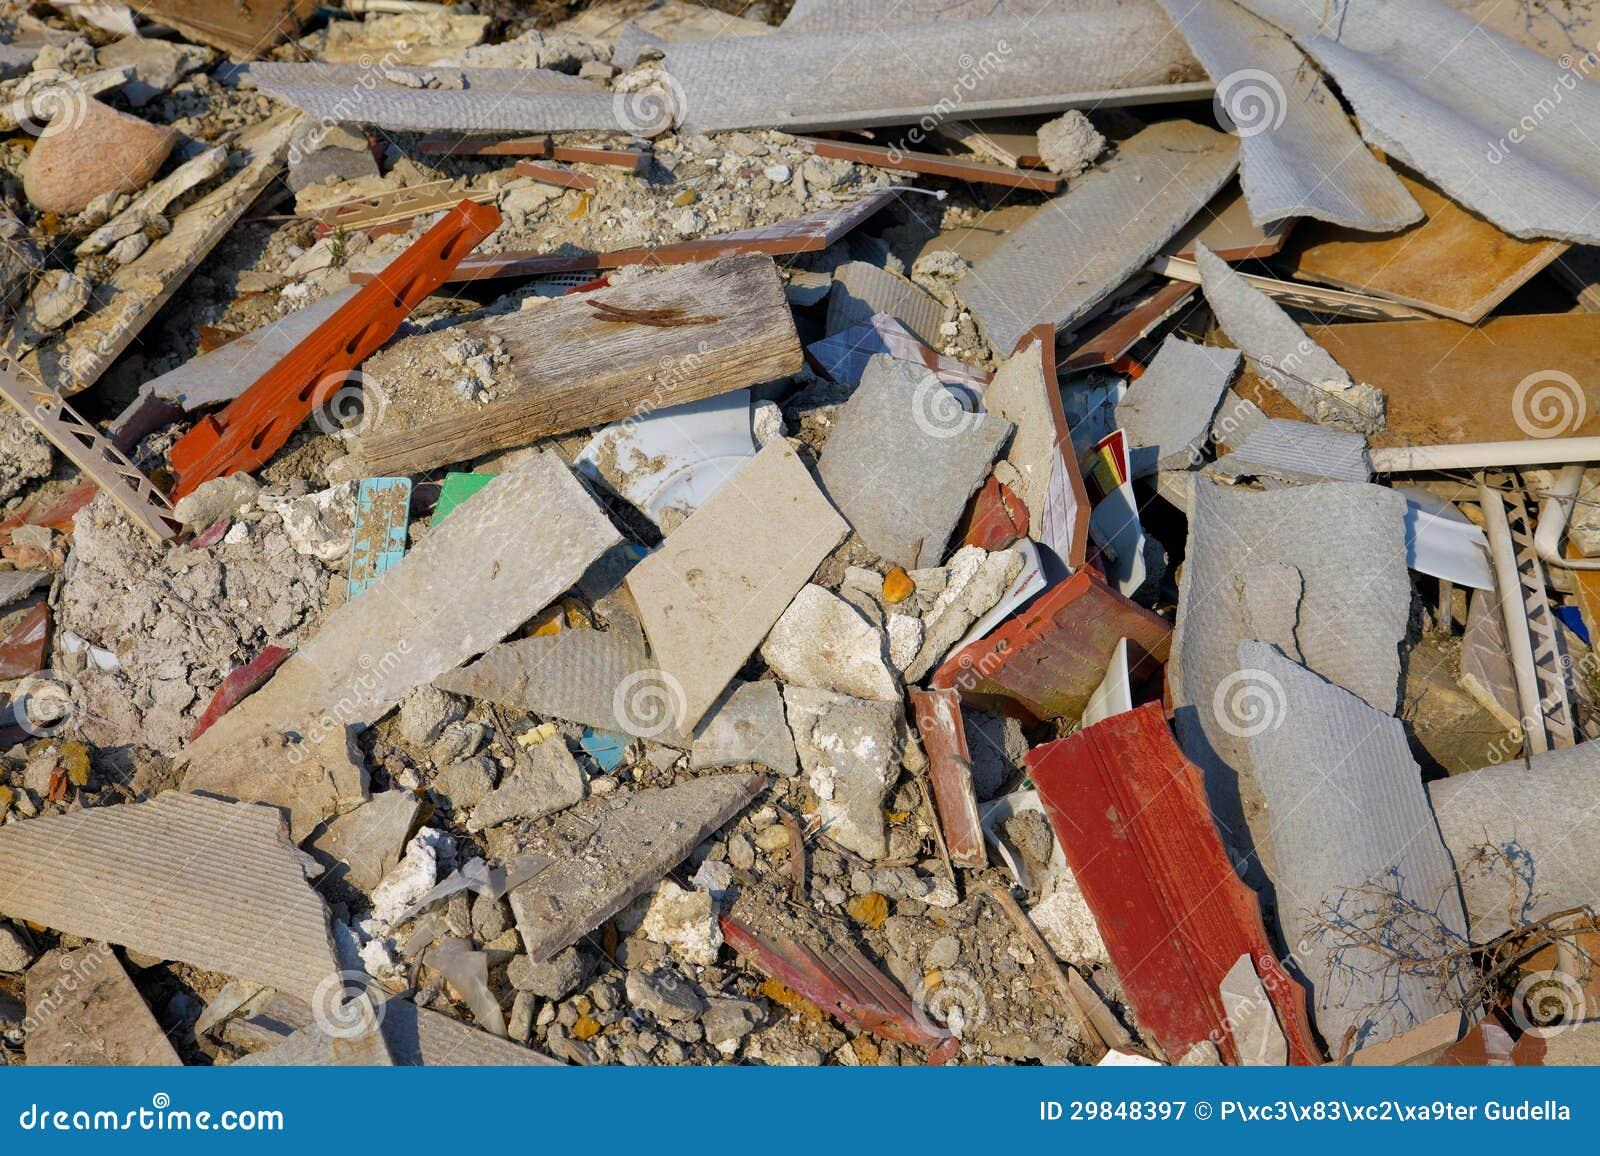 Pile Of Building Debris : Debris royalty free stock photography image